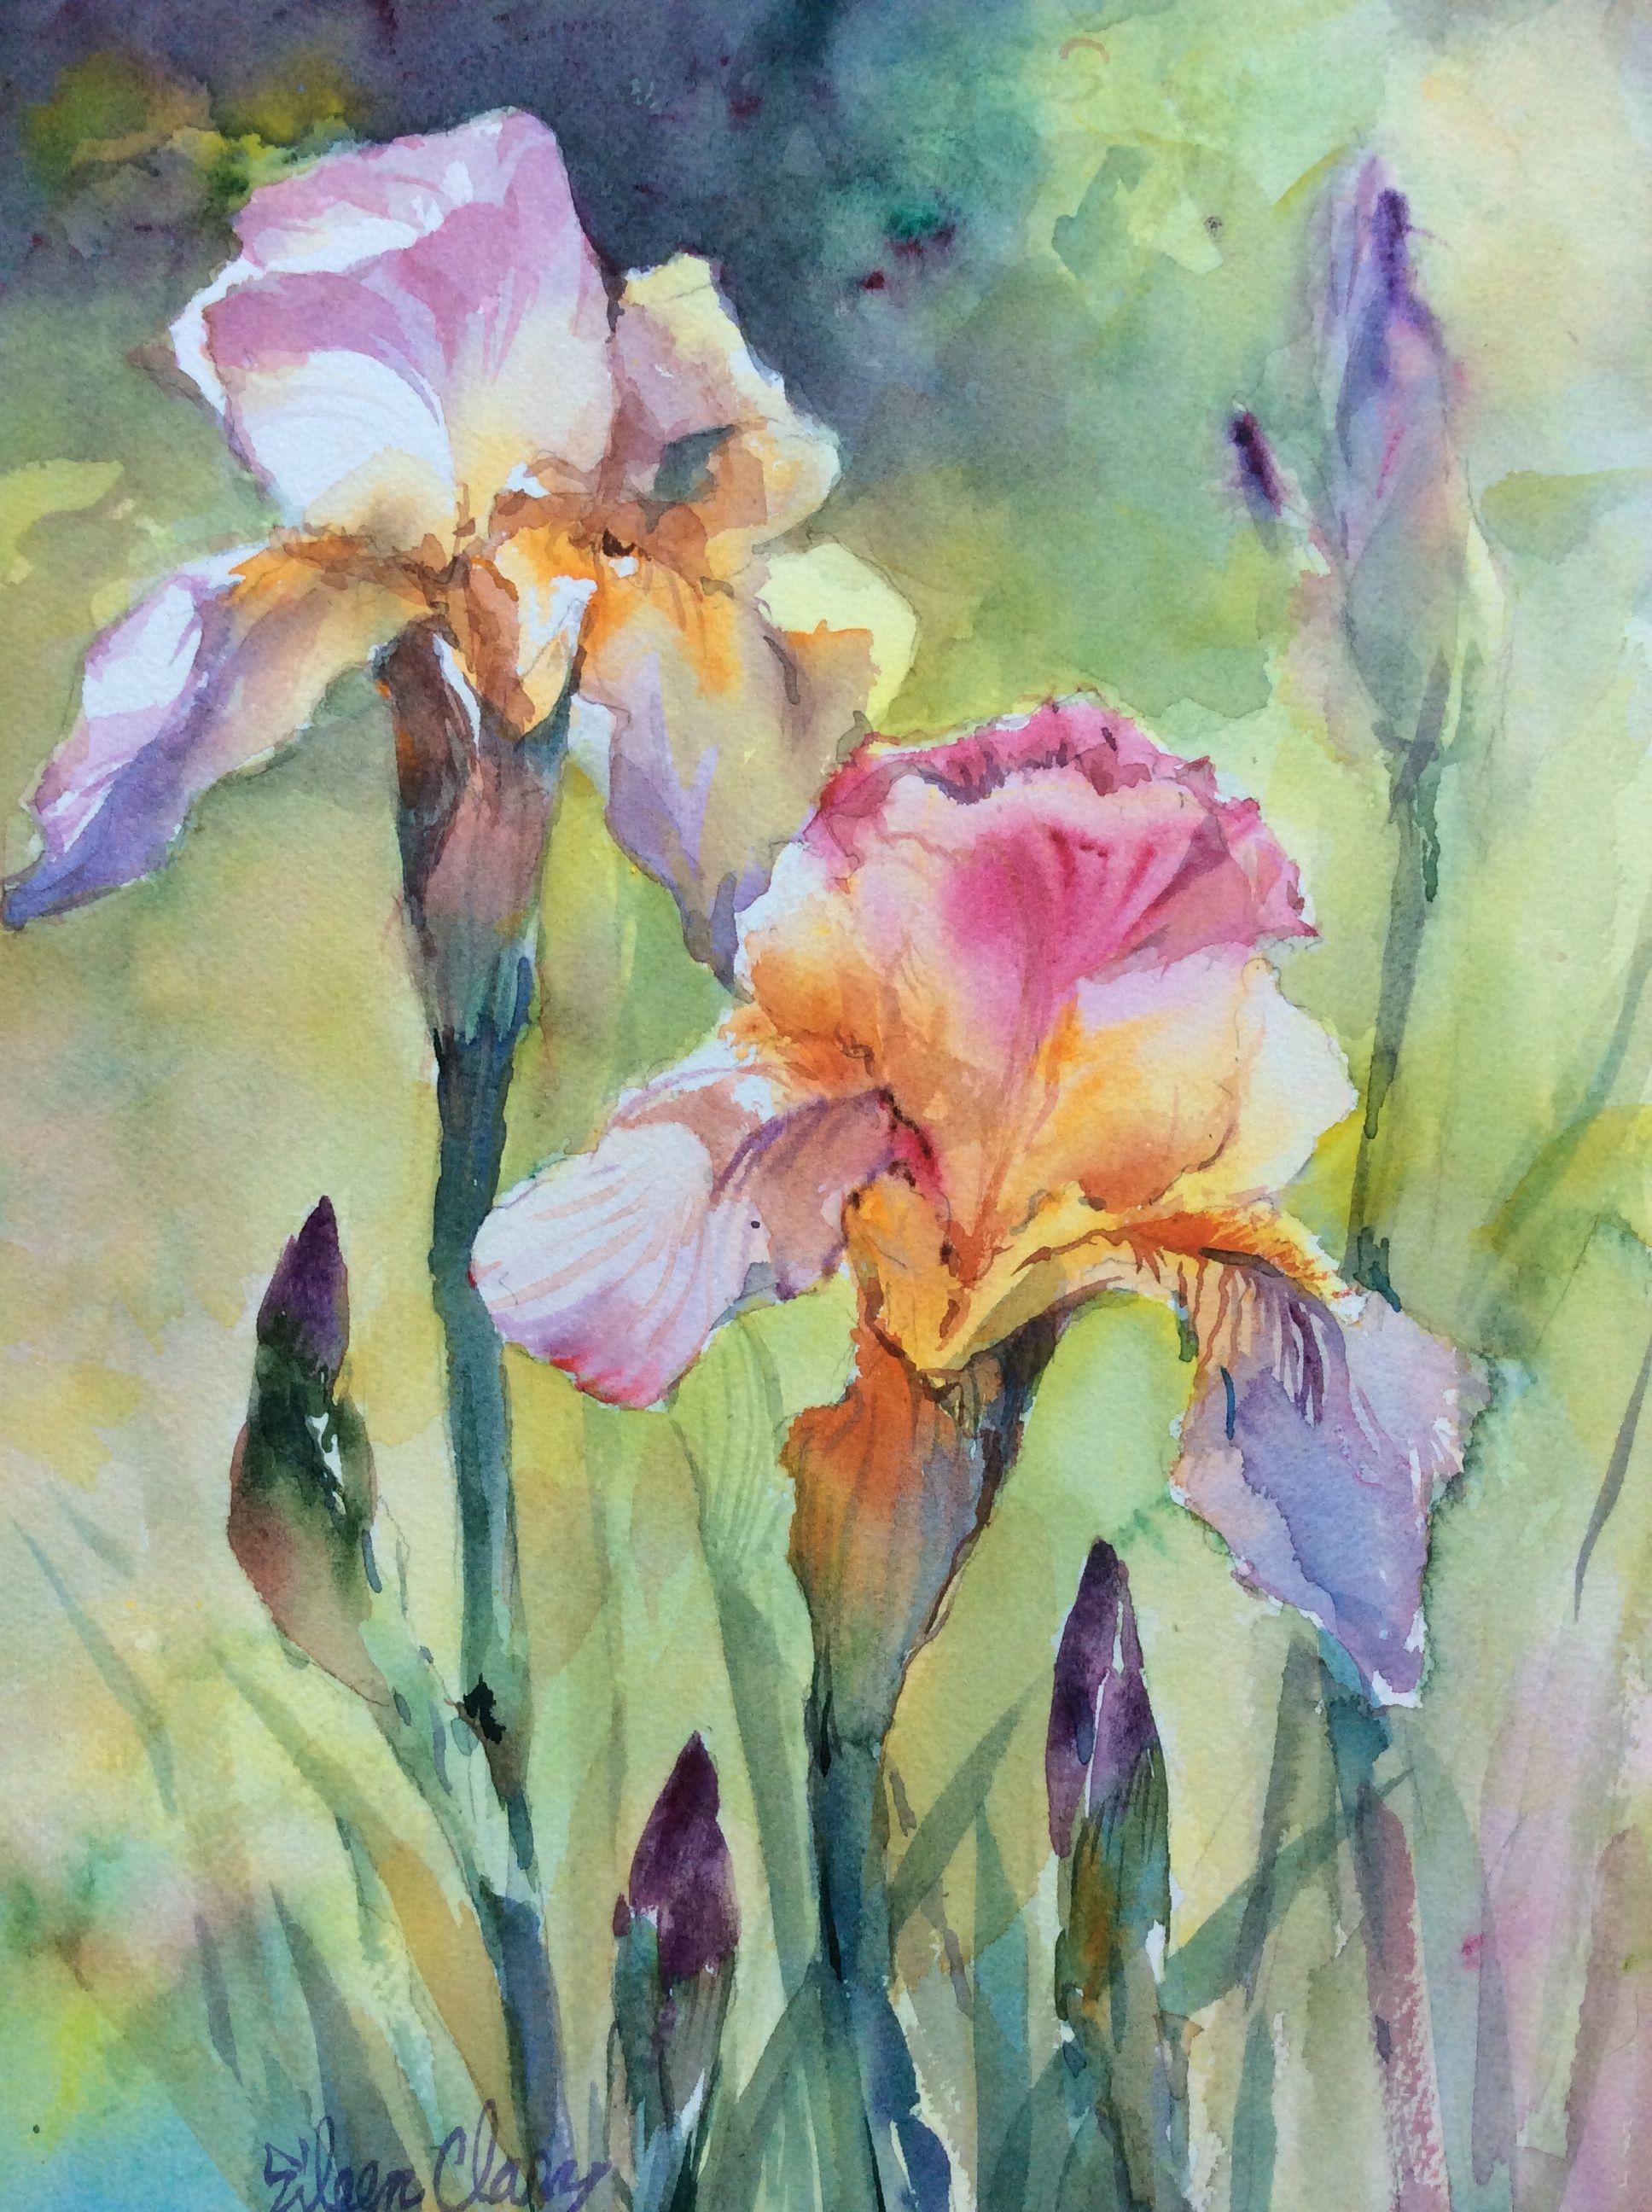 Watercolor Iris Iris Painting Floral Watercolor Watercolor Flowers Paintings